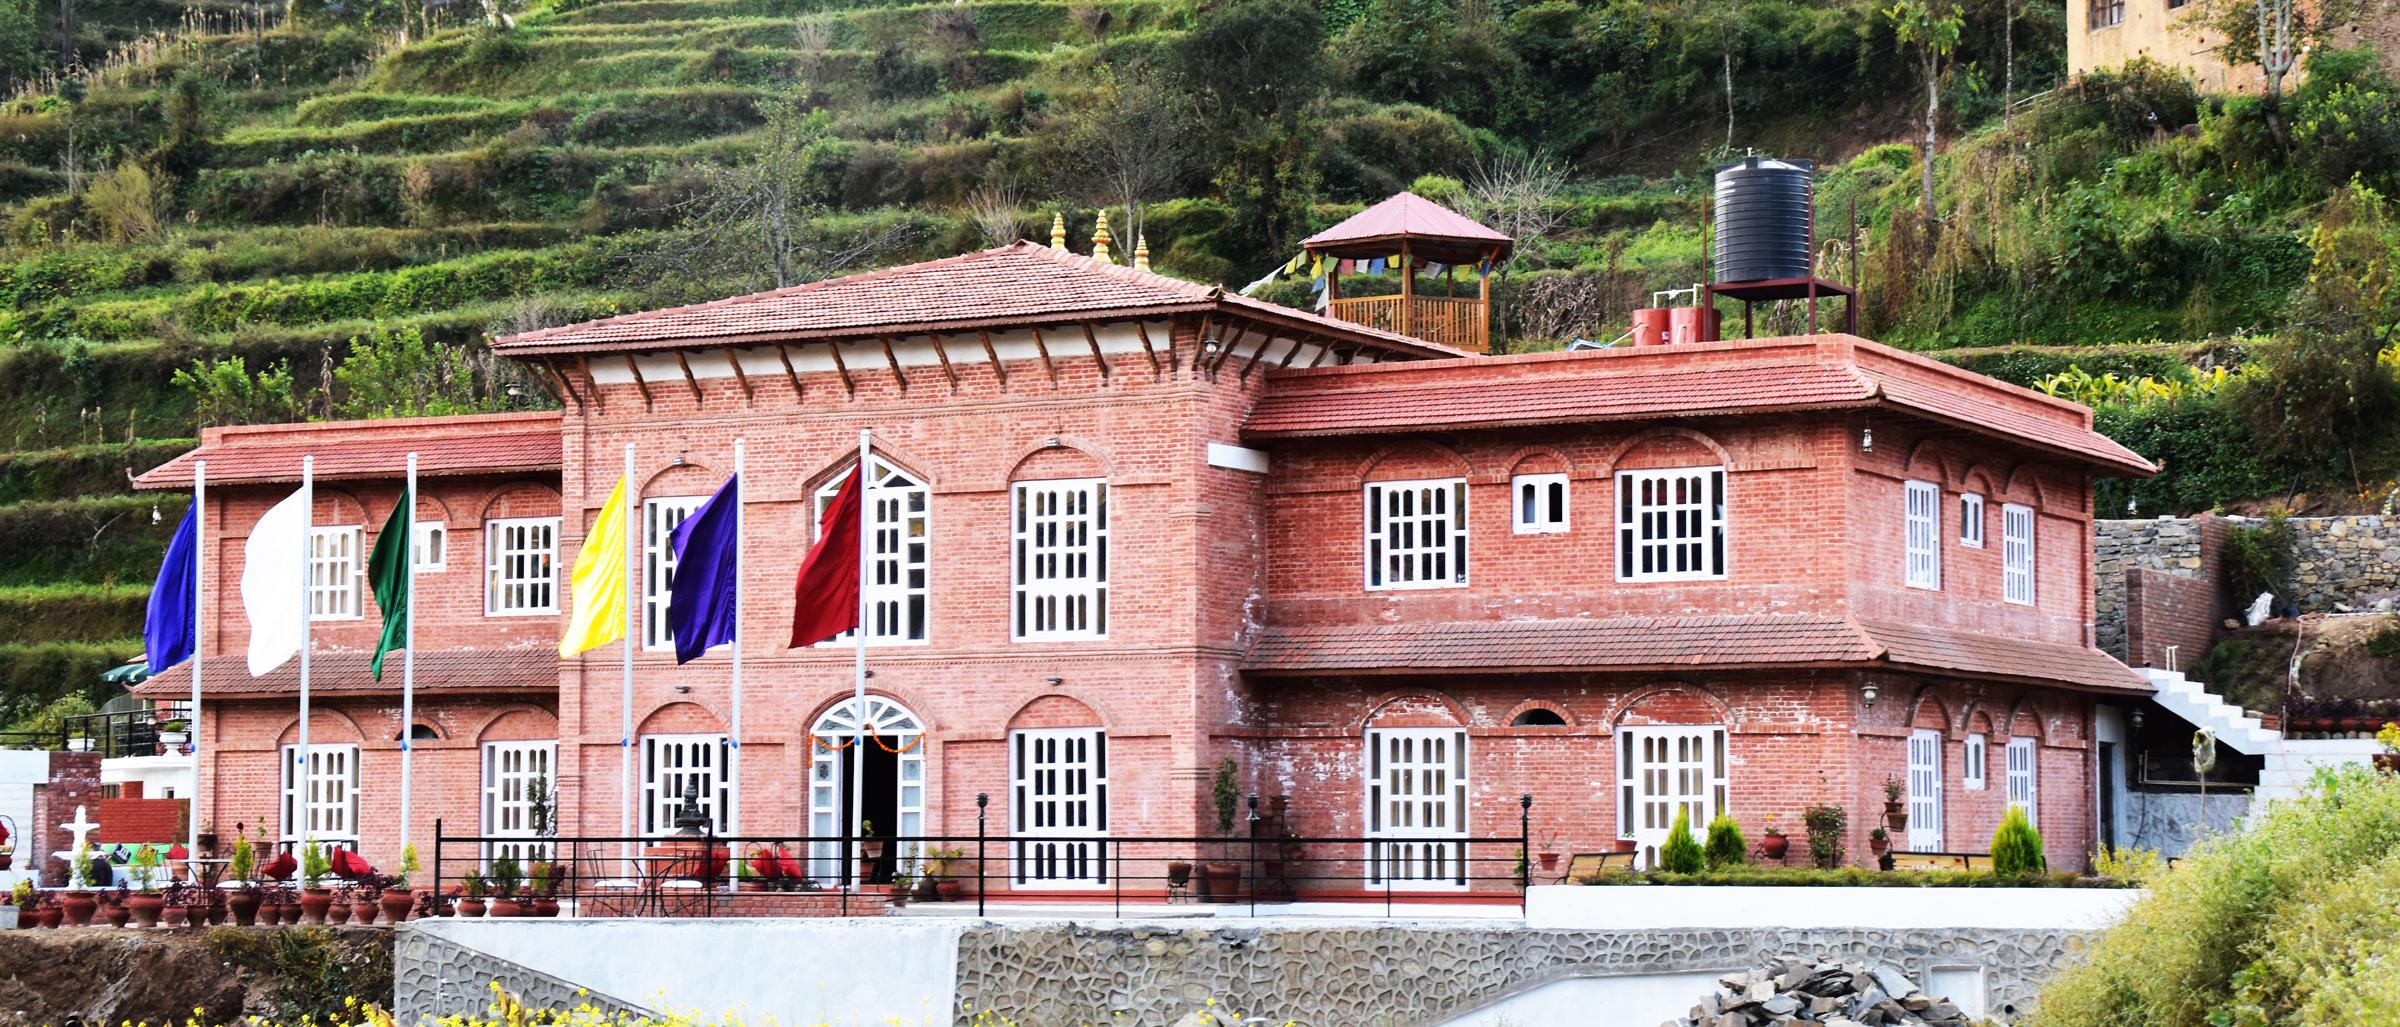 Adhyay Retreat Resort Beautiful Resort In Tistung